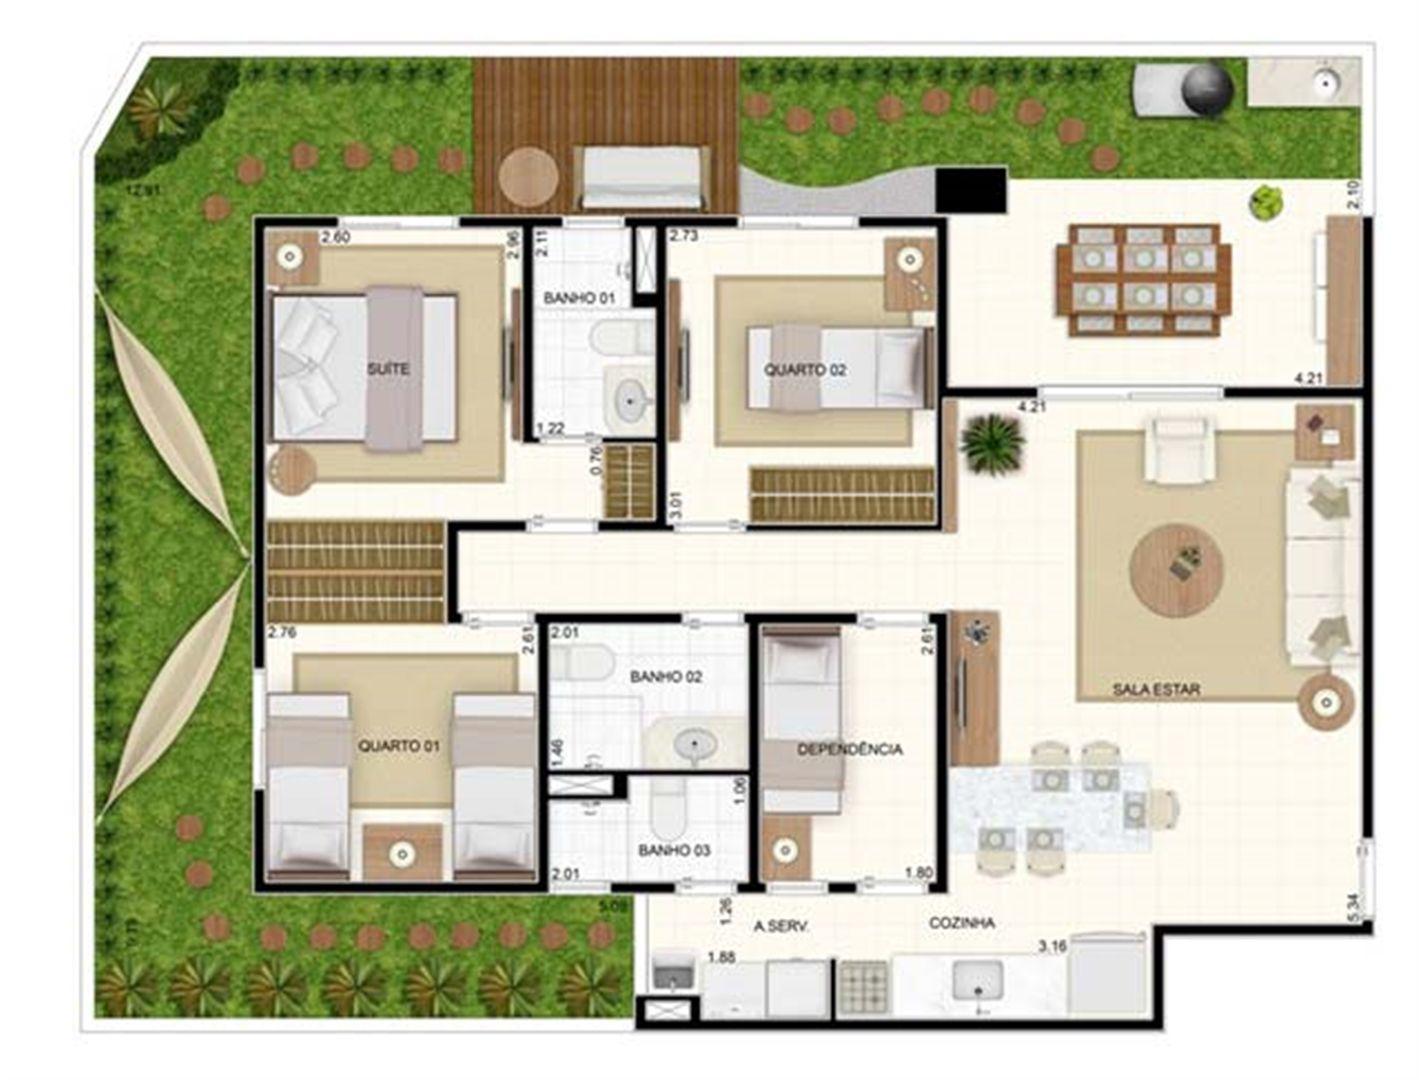 Giardino 3 dorms 129,10m²   Vita 2 Residencial Clube – Apartamento no  Pitimbu - Natal - Rio Grande do Norte